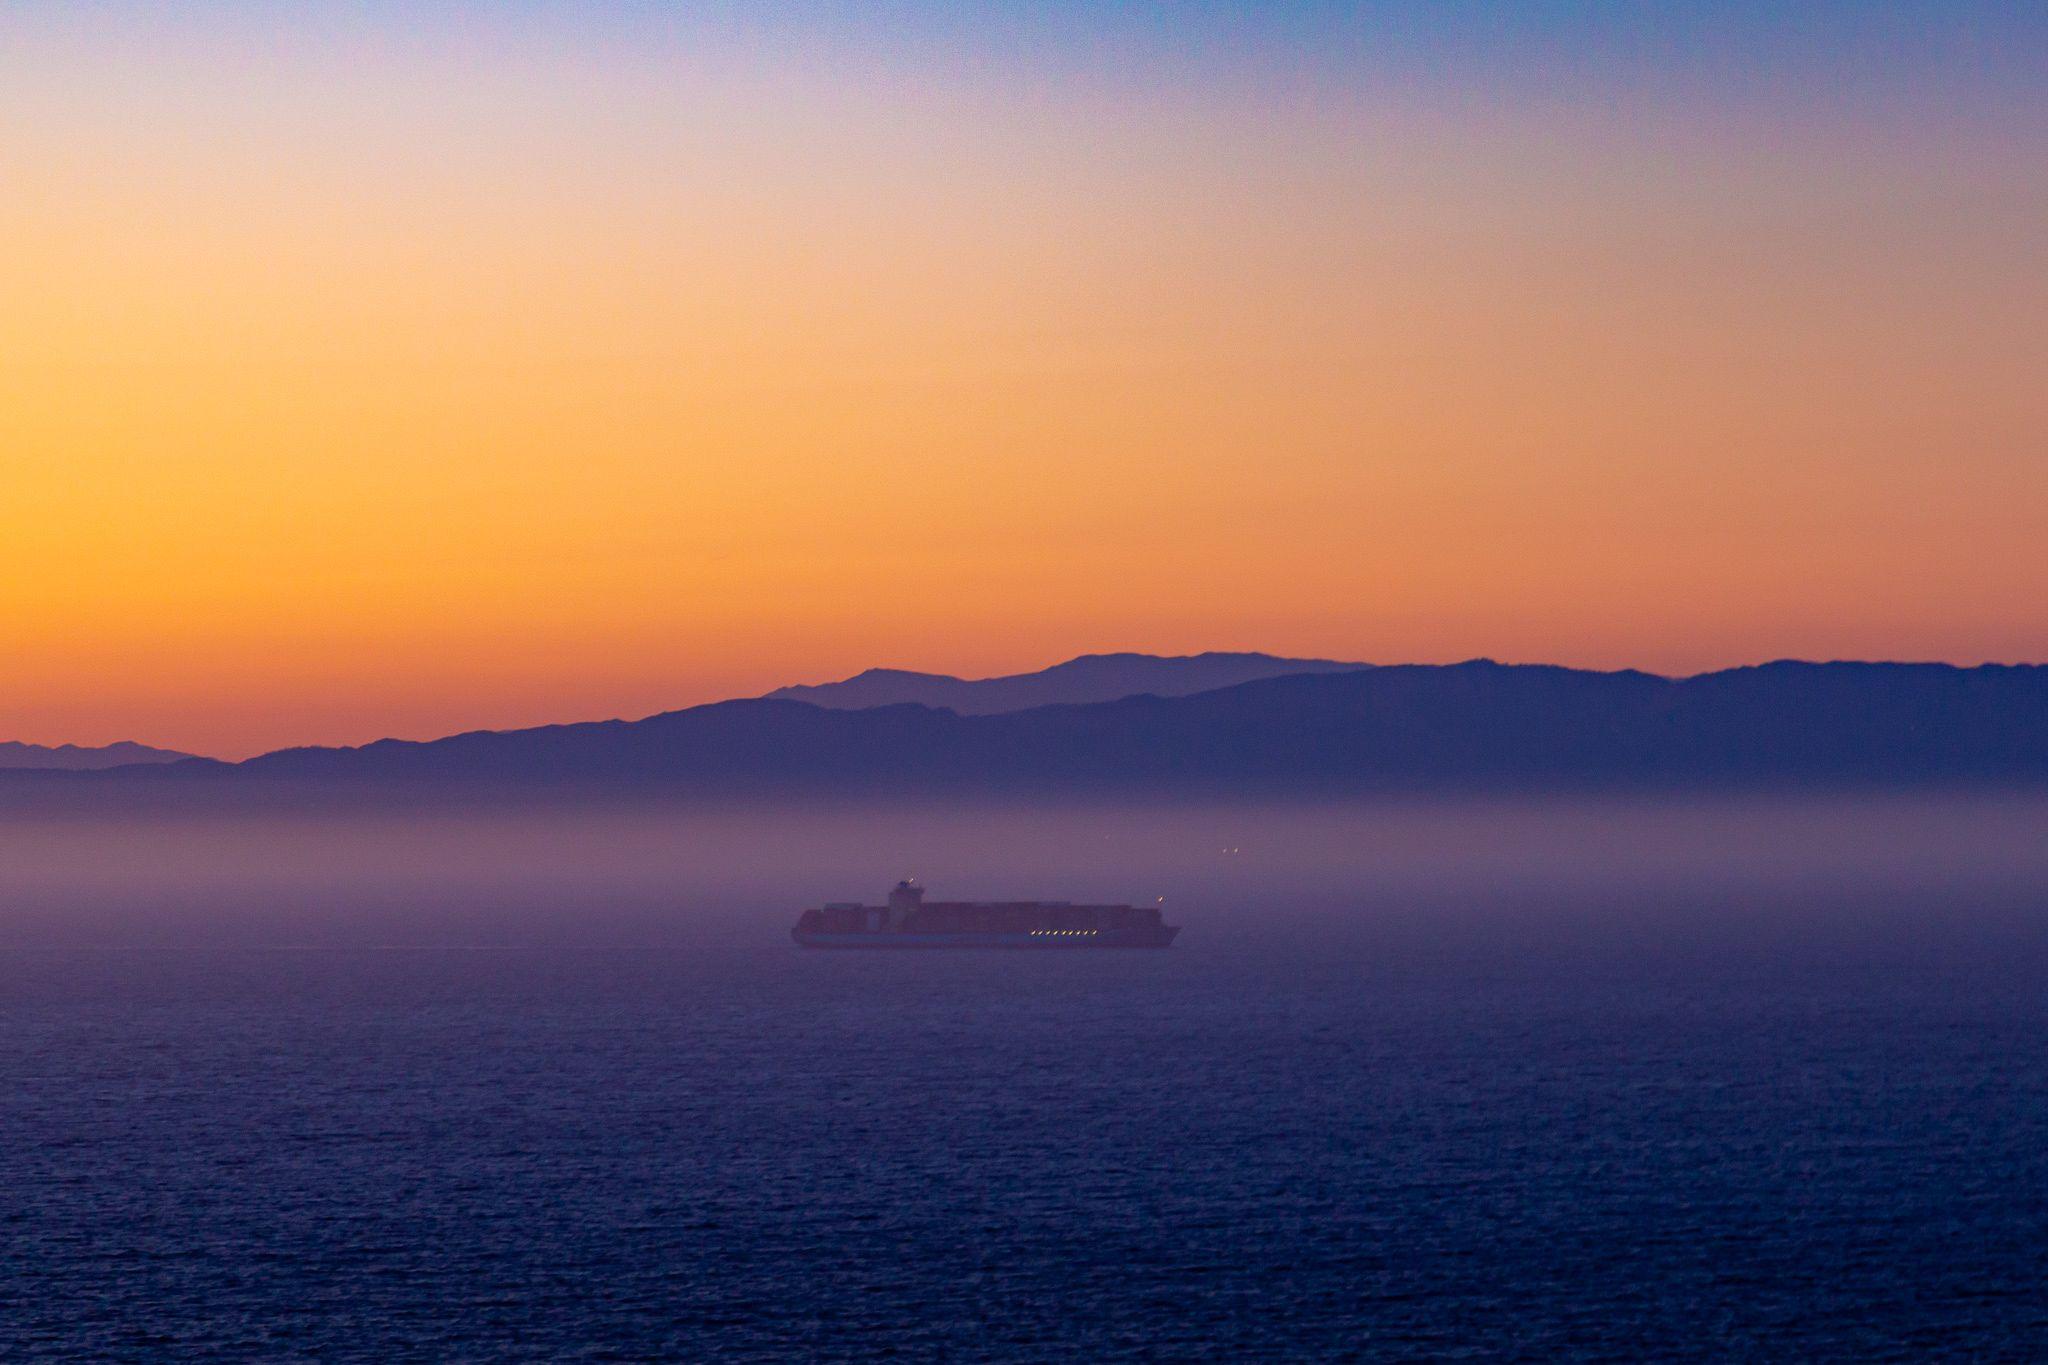 Ship Sailing in Santa Barbara Channel